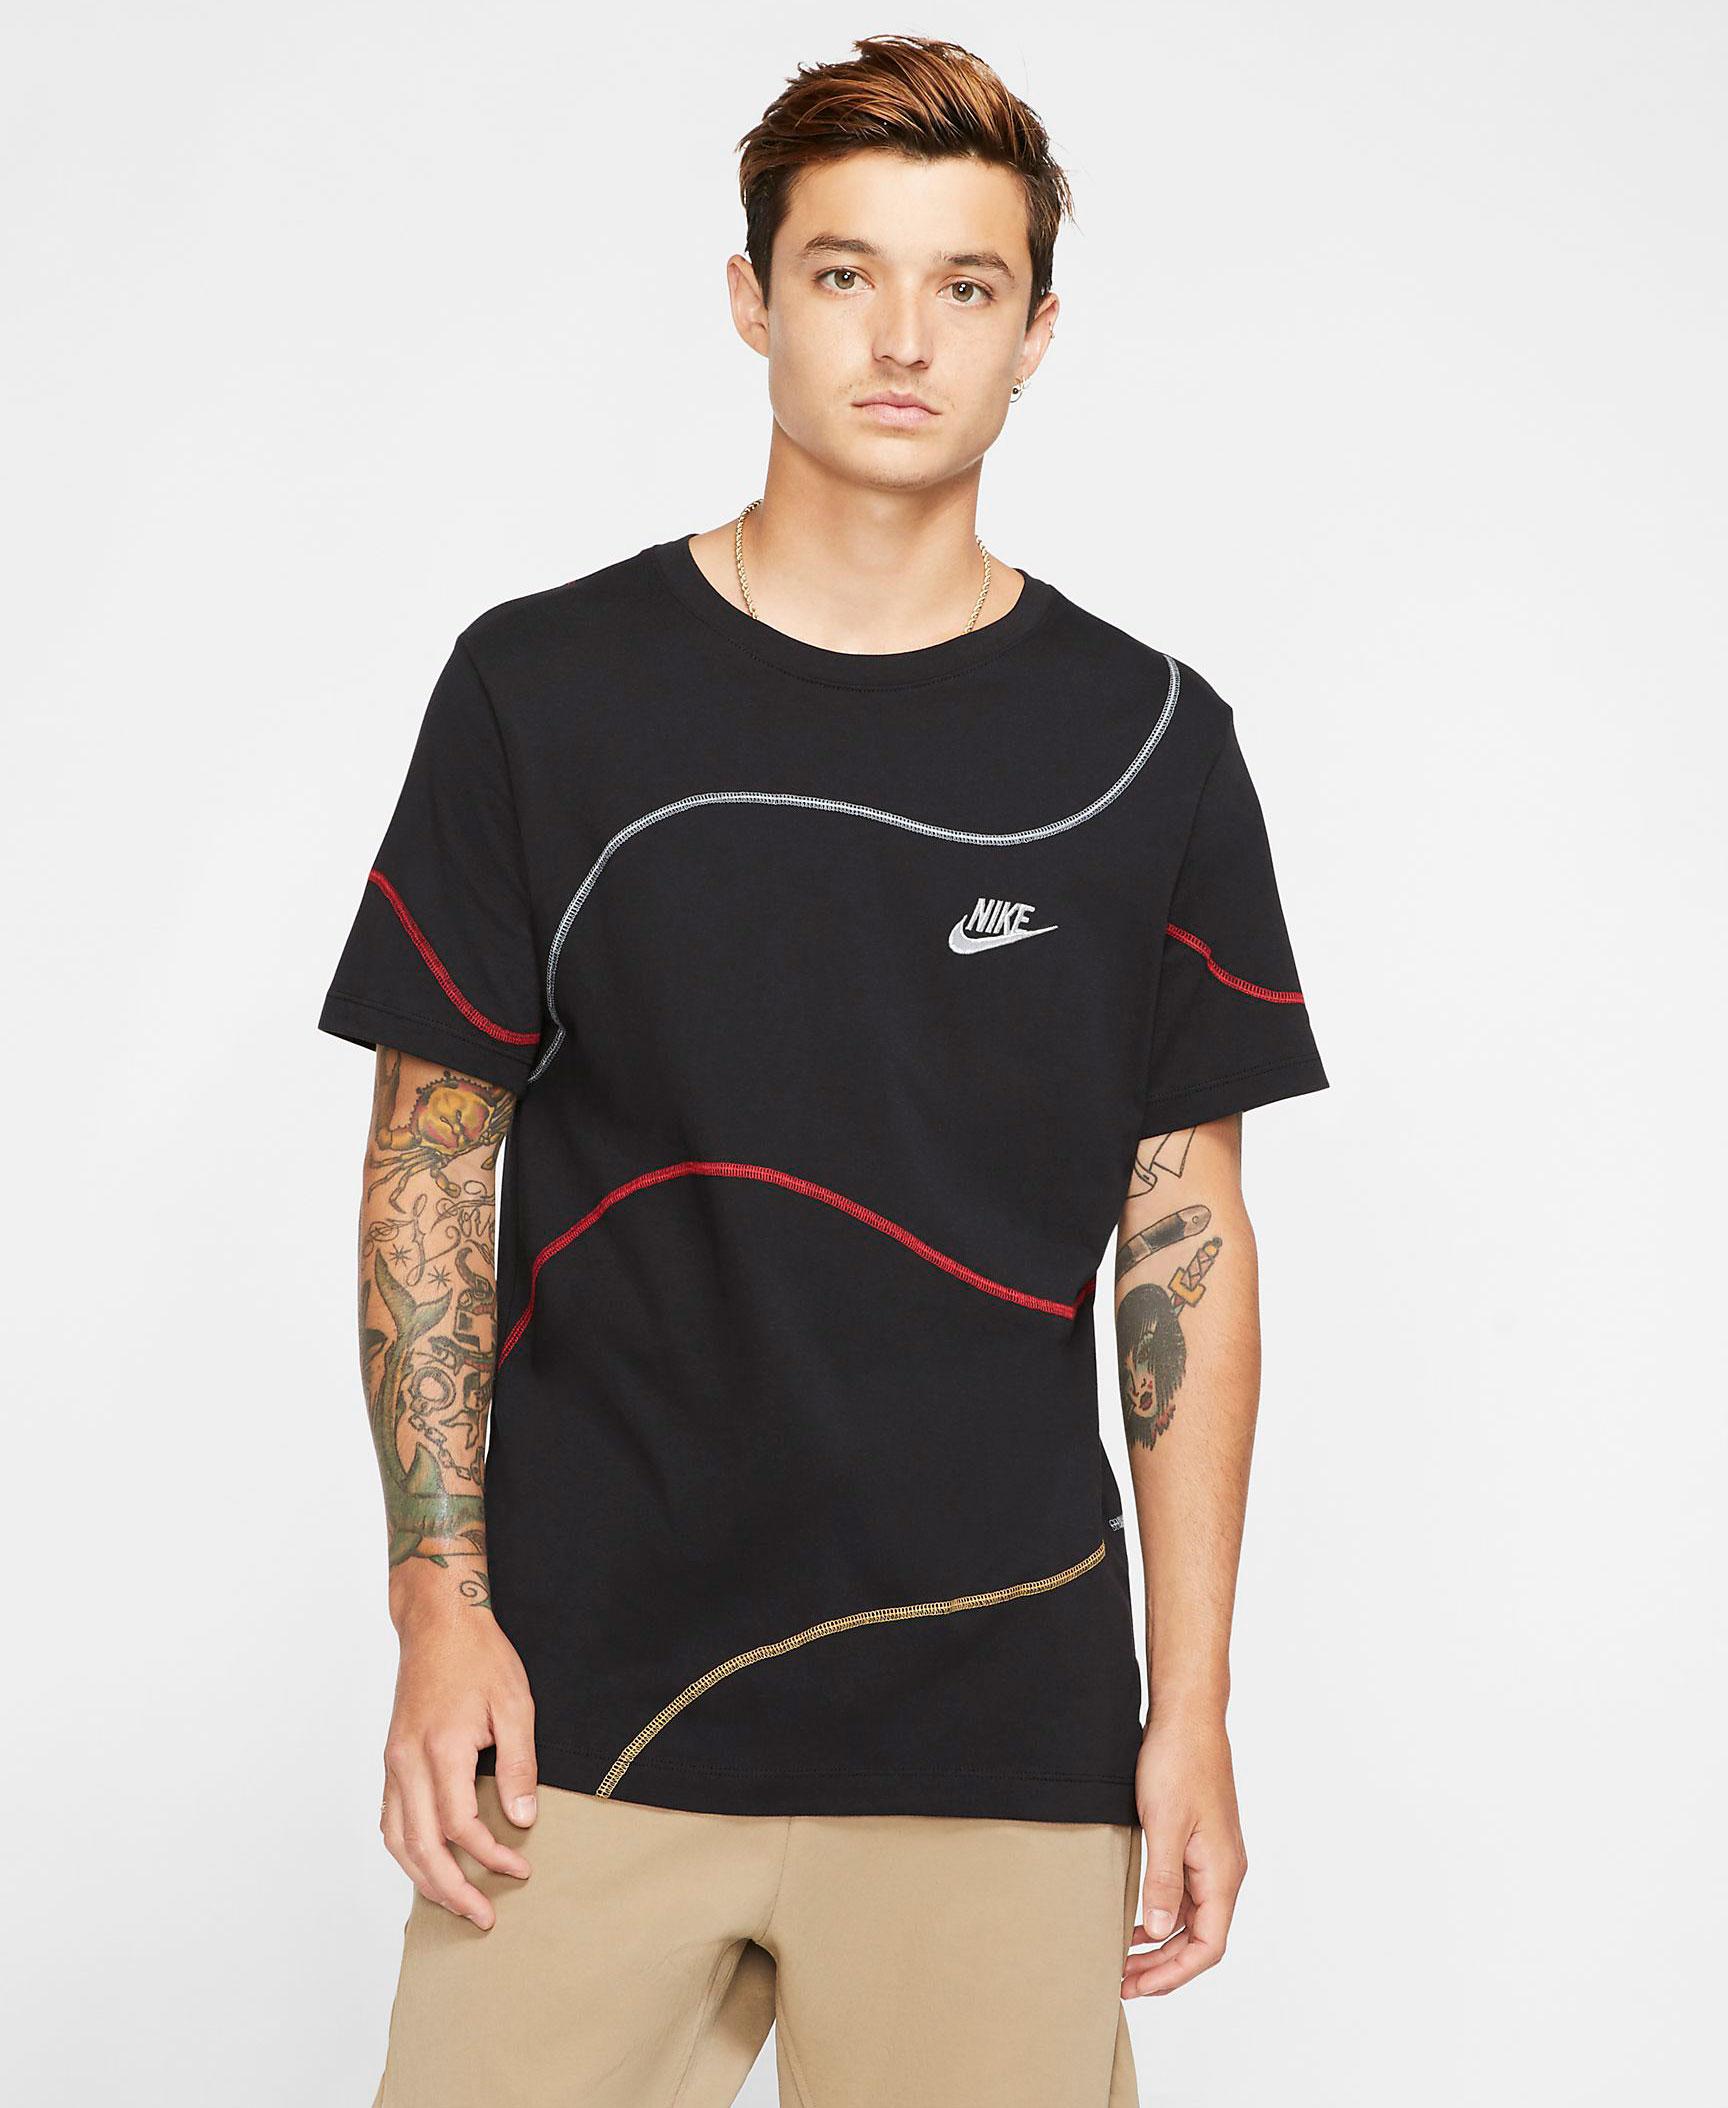 nike-air-max-inside-out-shirt-black